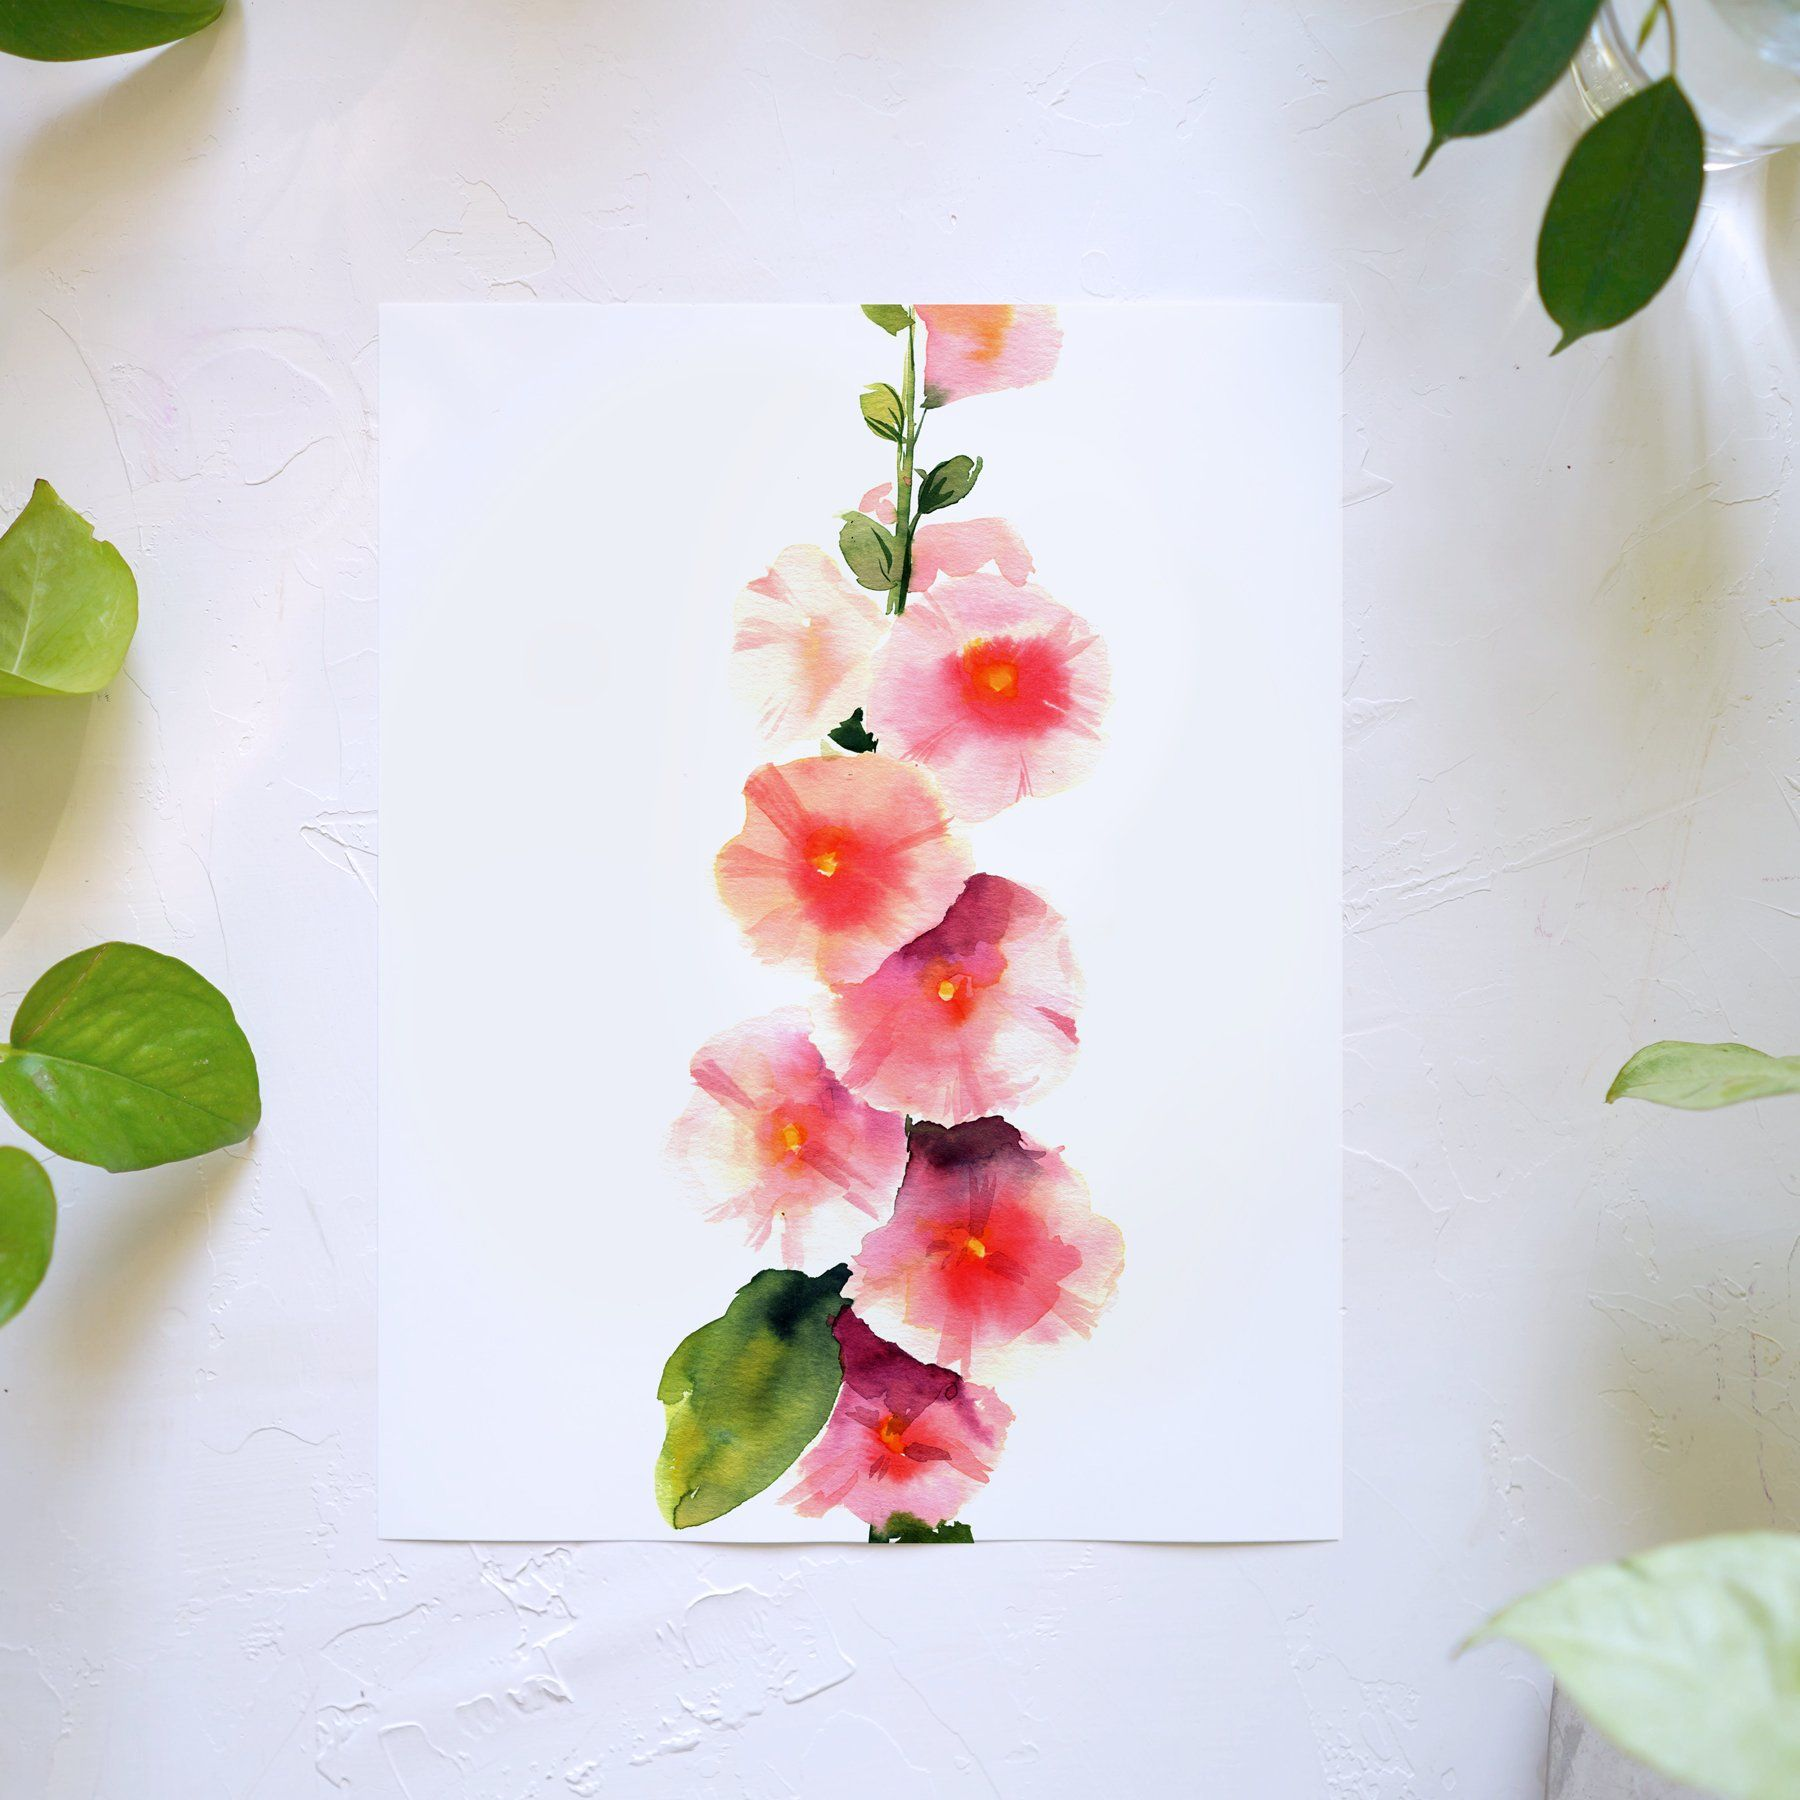 Hollyhock Watercolor Kit In 2020 Watercolor Kit Let S Make Art